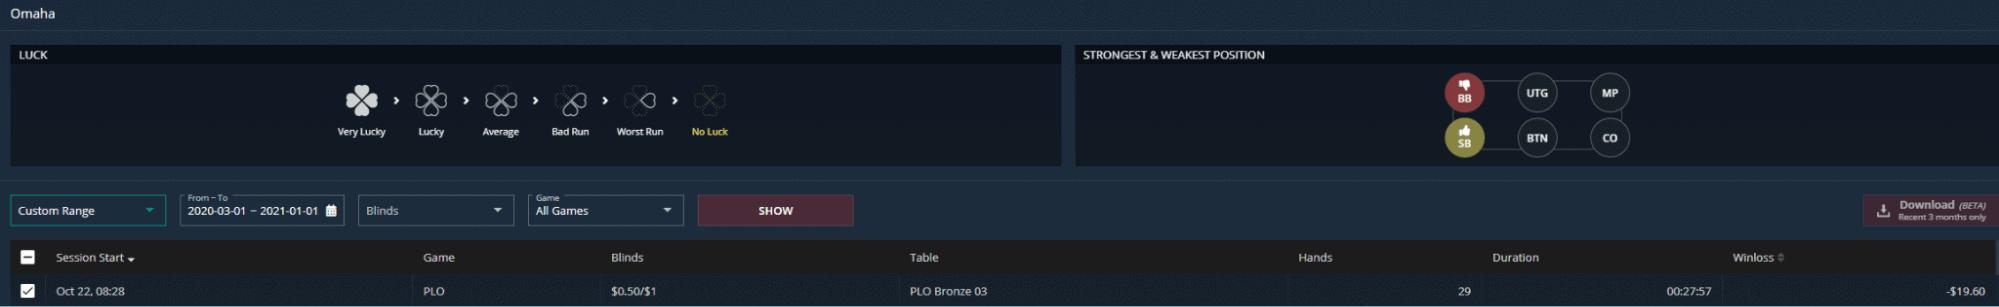 GGPoker's PokerCraft filter section